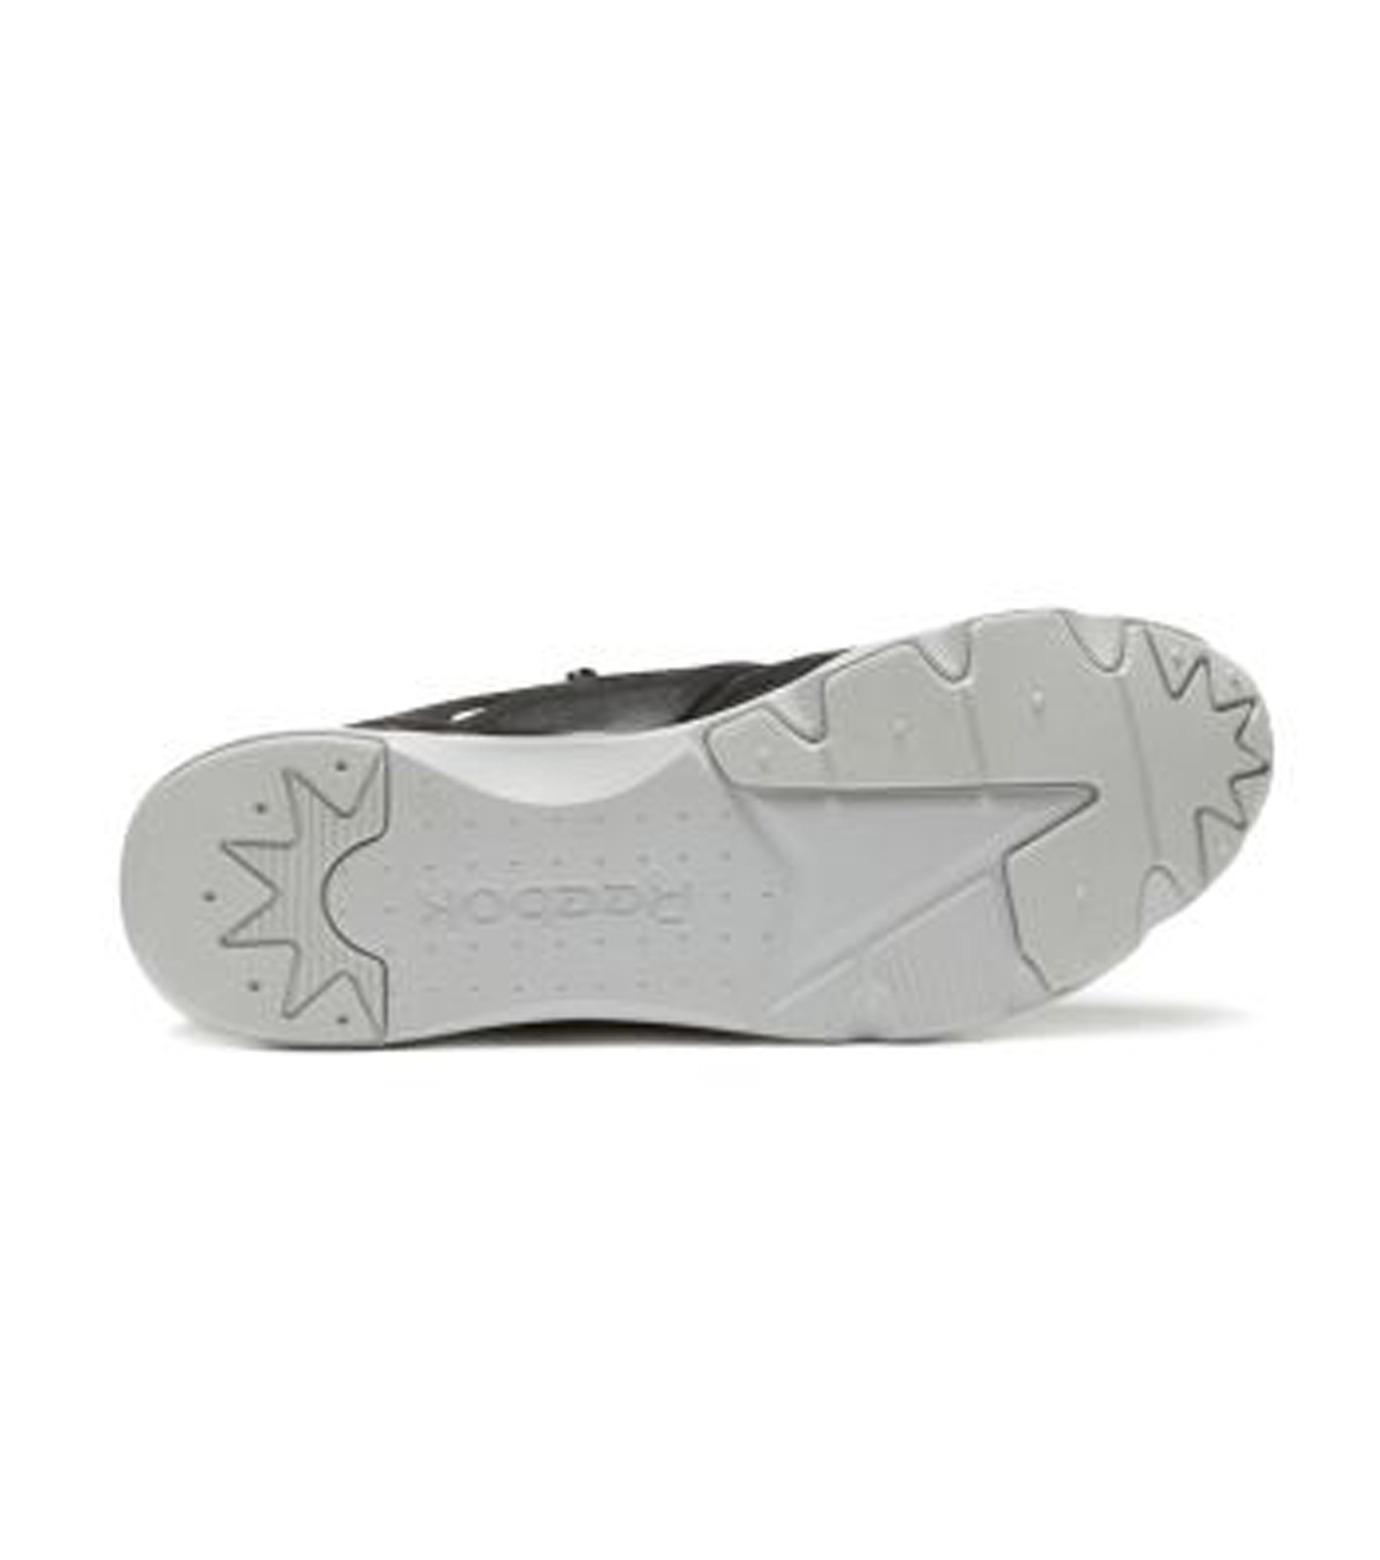 Reebok(リーボック)のFURYLITE TM-BLACK(シューズ/shoes)-V67734-13 拡大詳細画像2